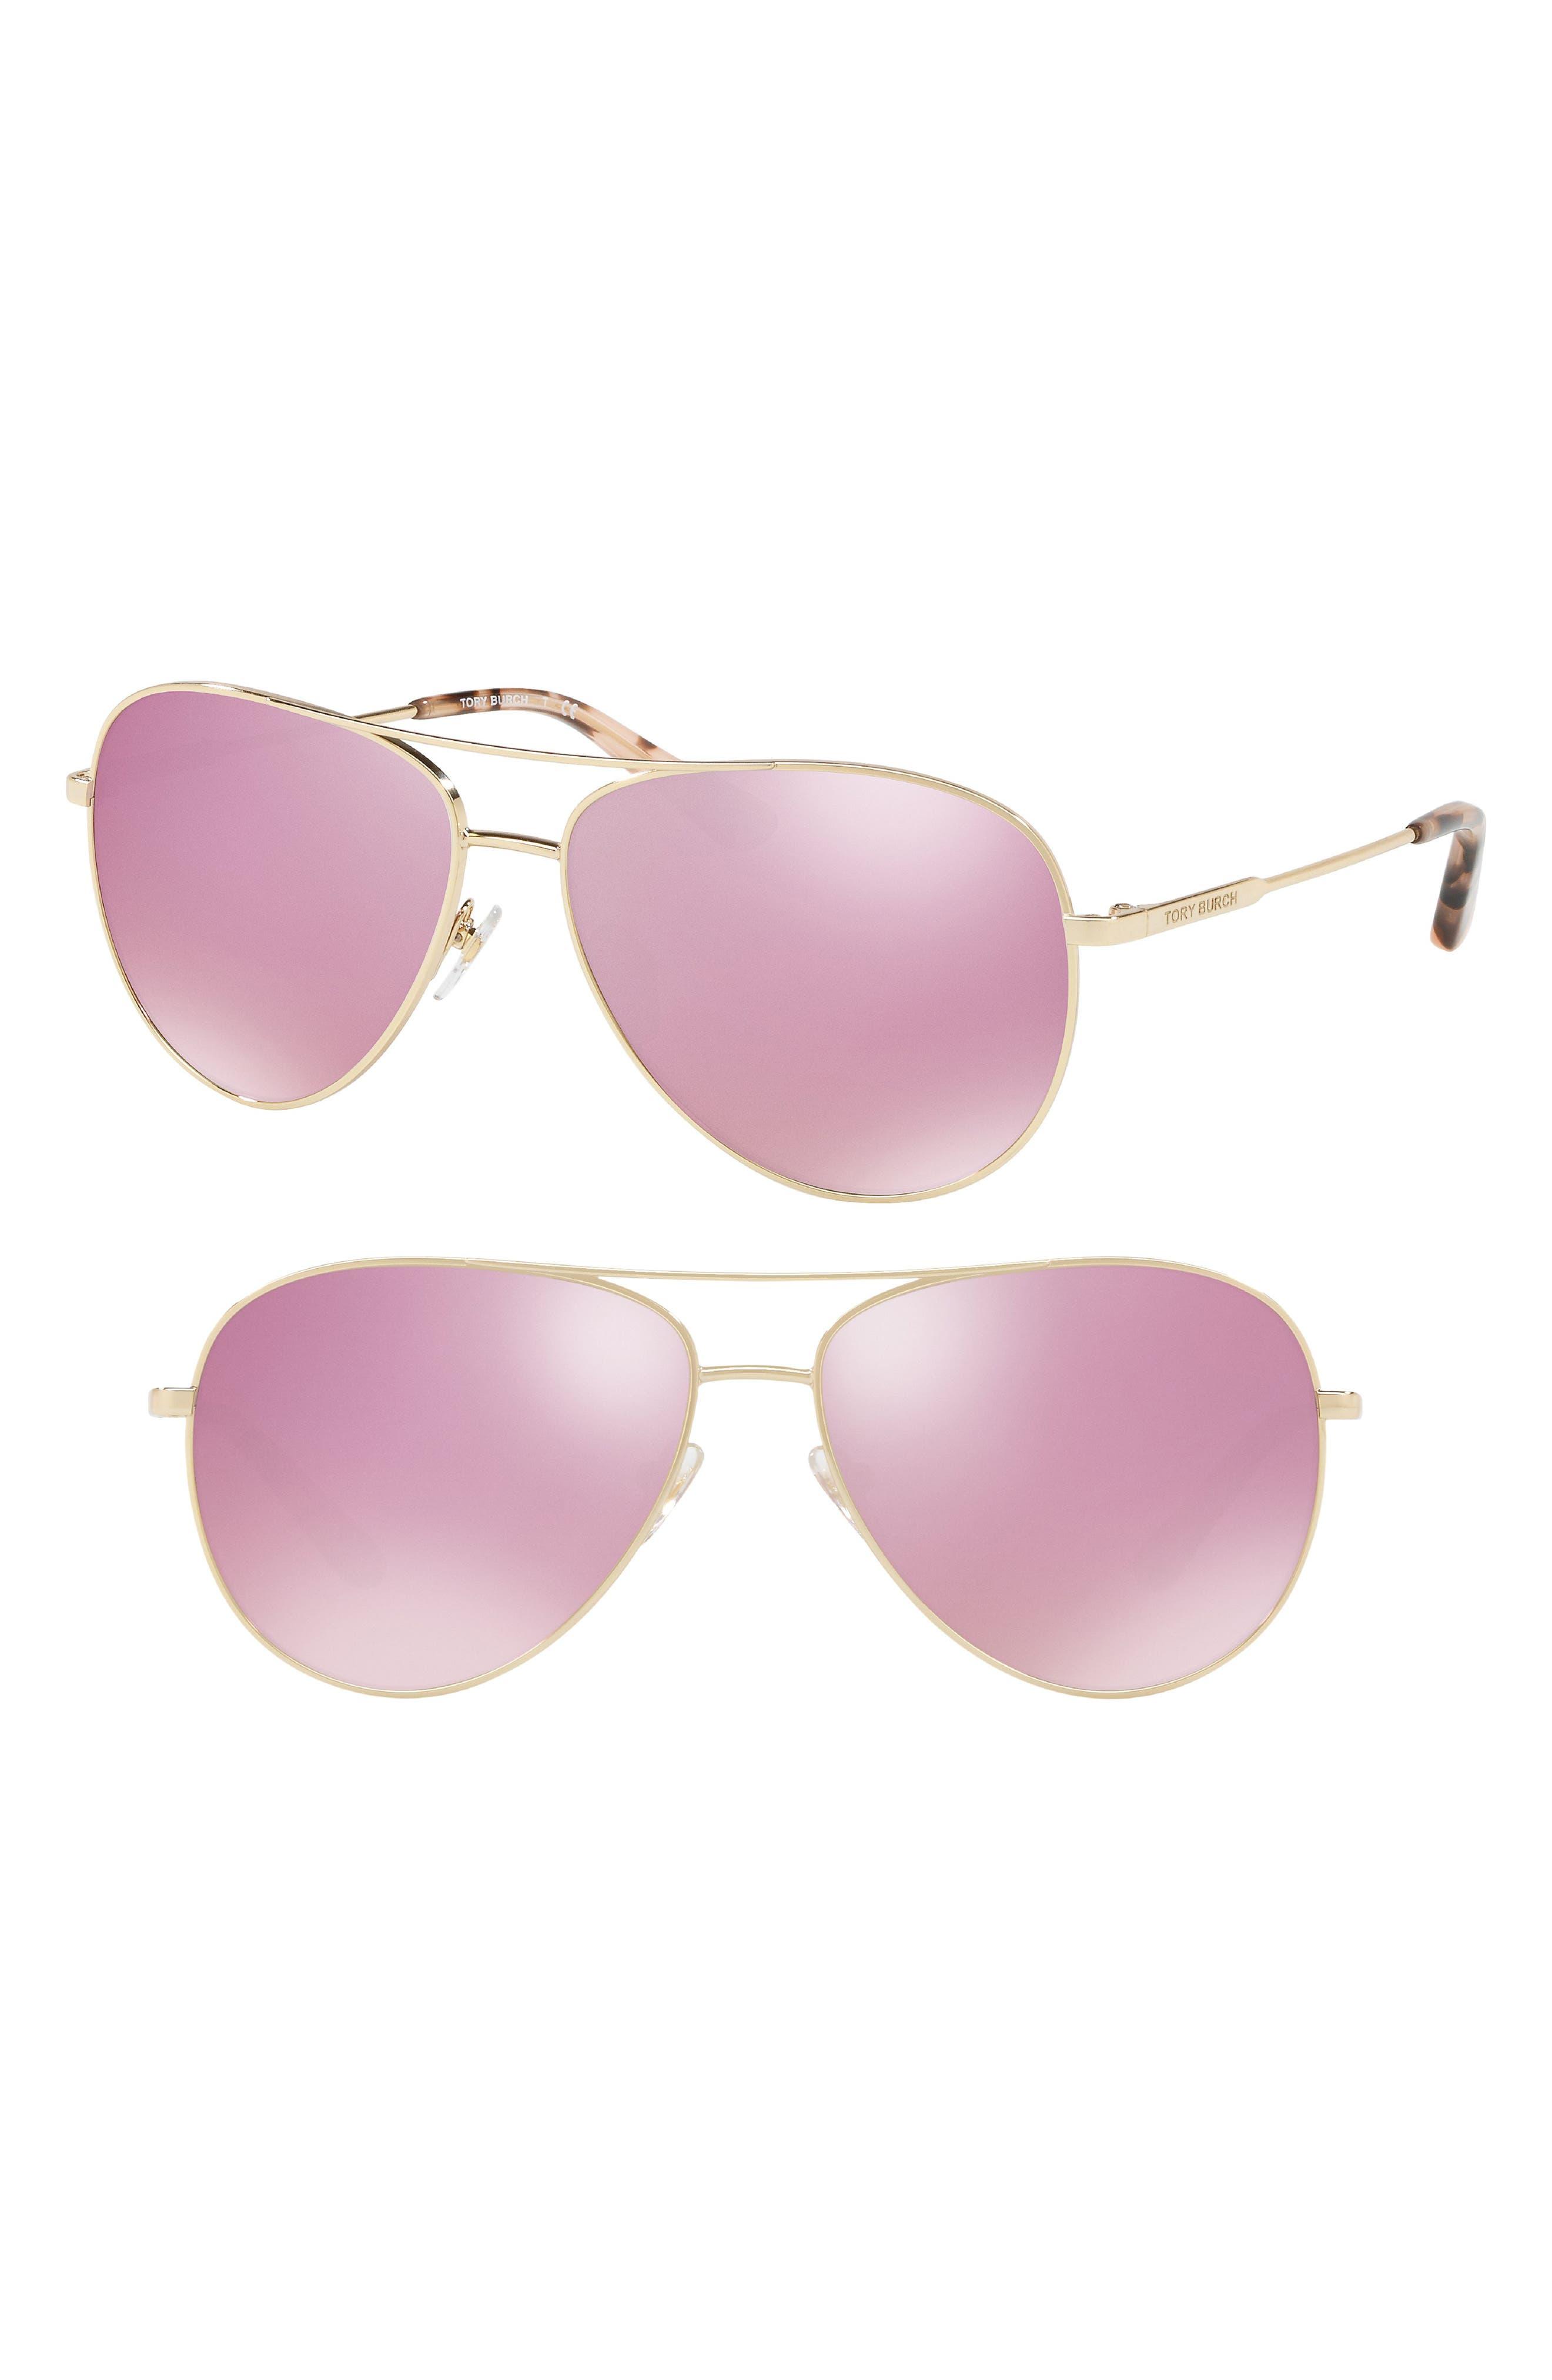 59mm Thin Metal Aviator Sunglasses,                             Main thumbnail 1, color,                             PINK